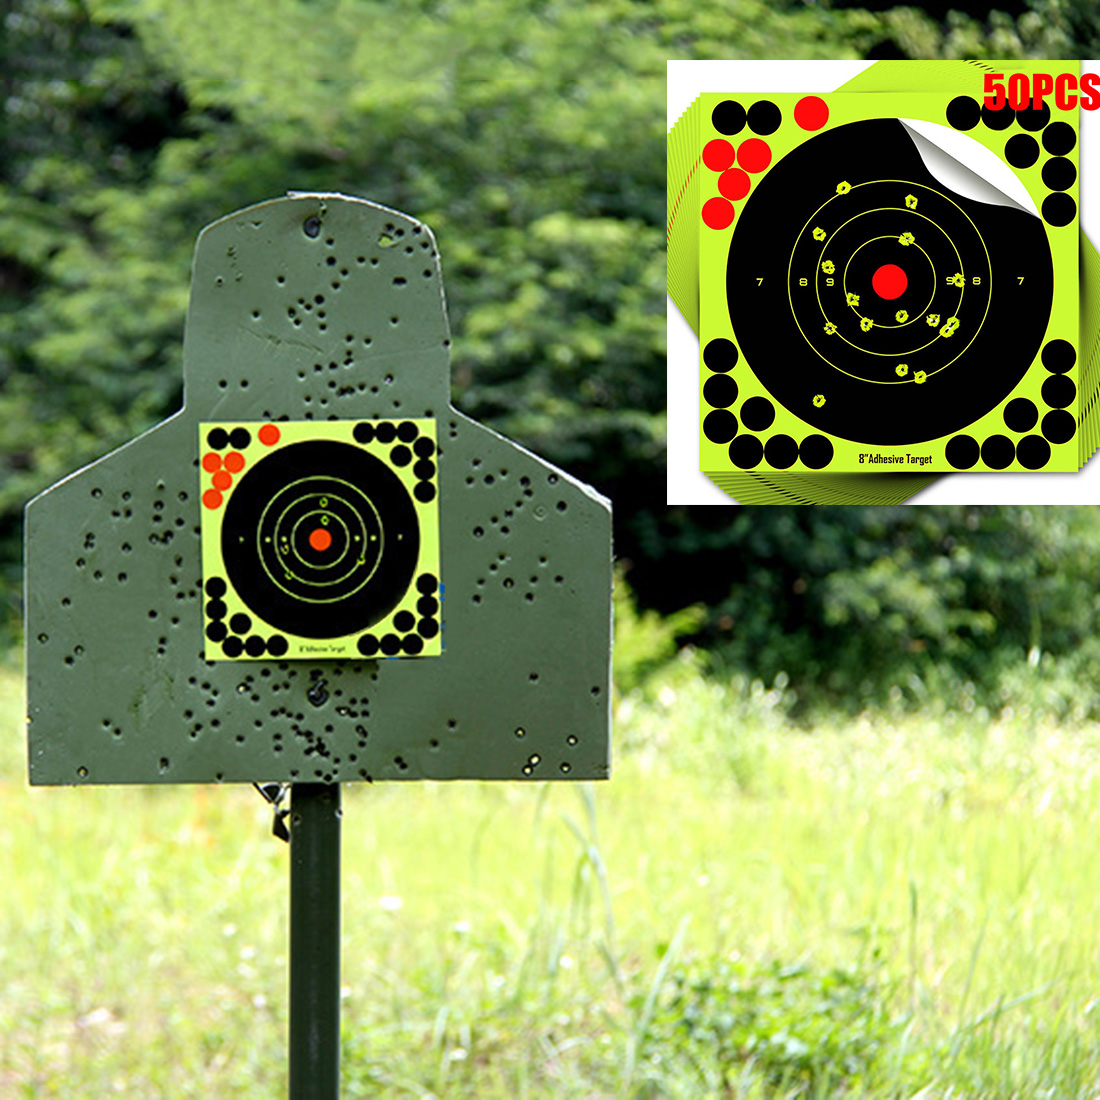 50pcs 20cm Target Practice Reactive Splatter Glow Shot Rifle Green Florescent Paper Strong Attachment Glue Target Papers